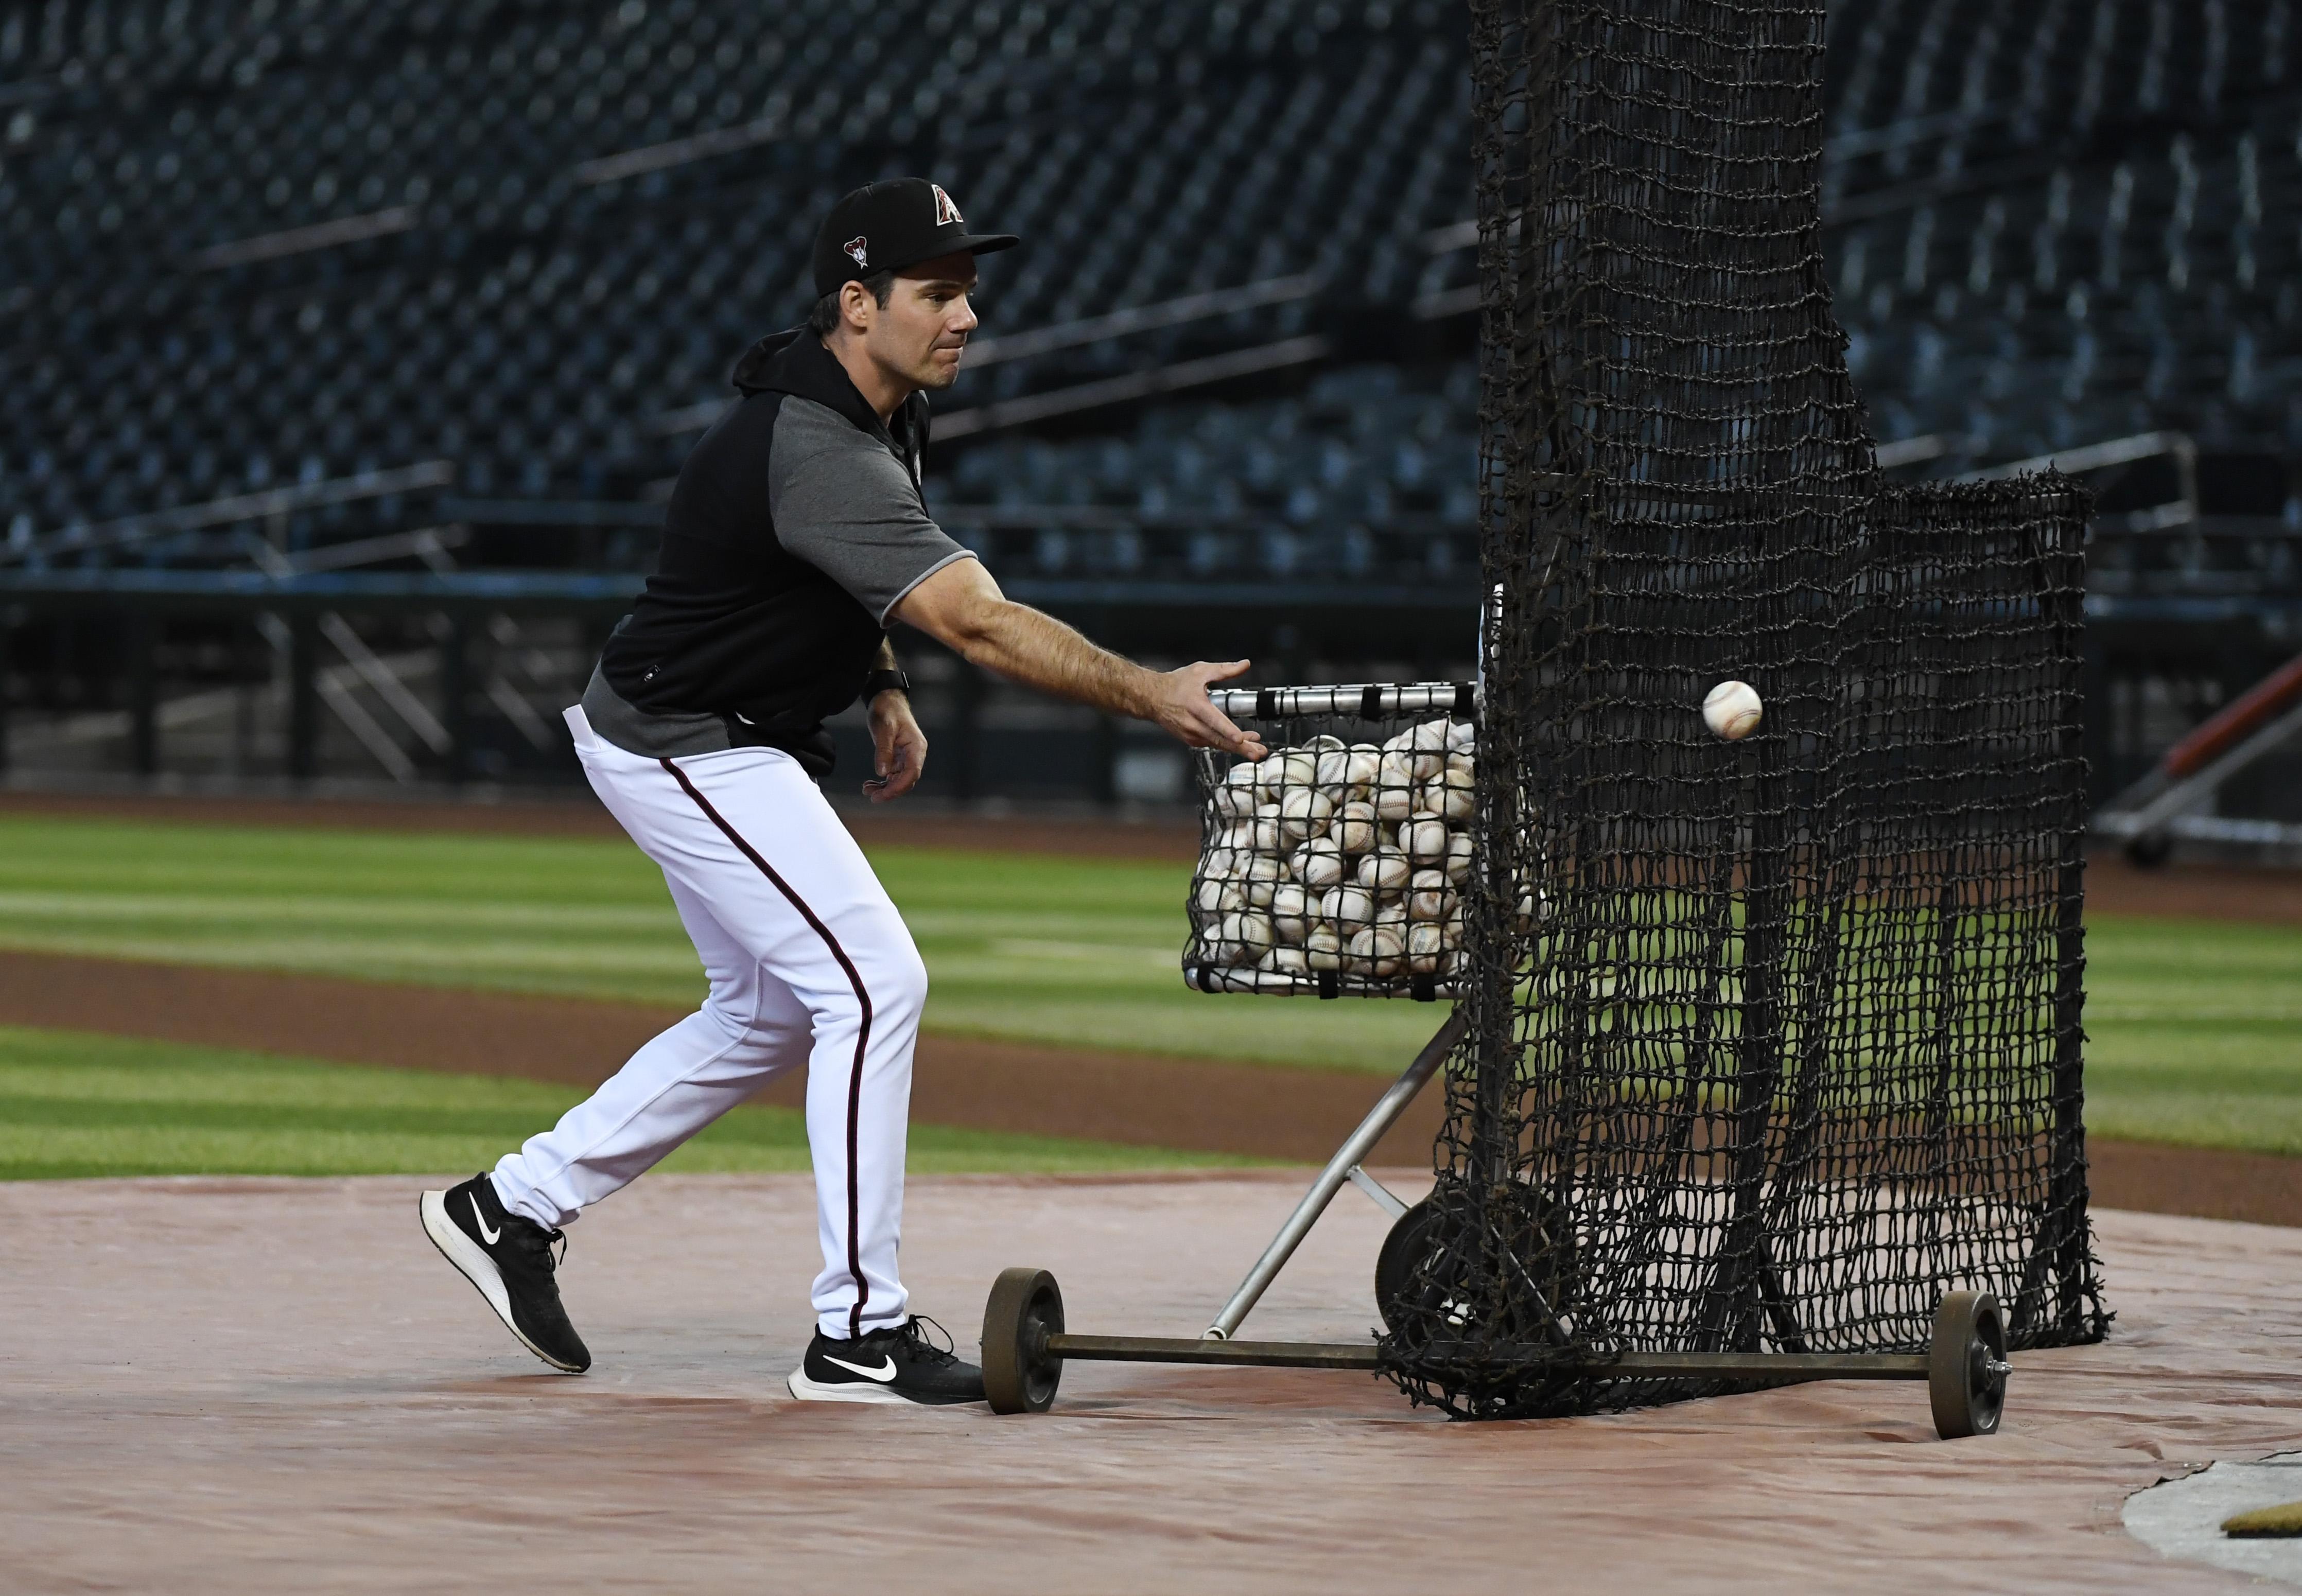 Co-Hitting coach Drew Hedman tosses balls in batting practice.